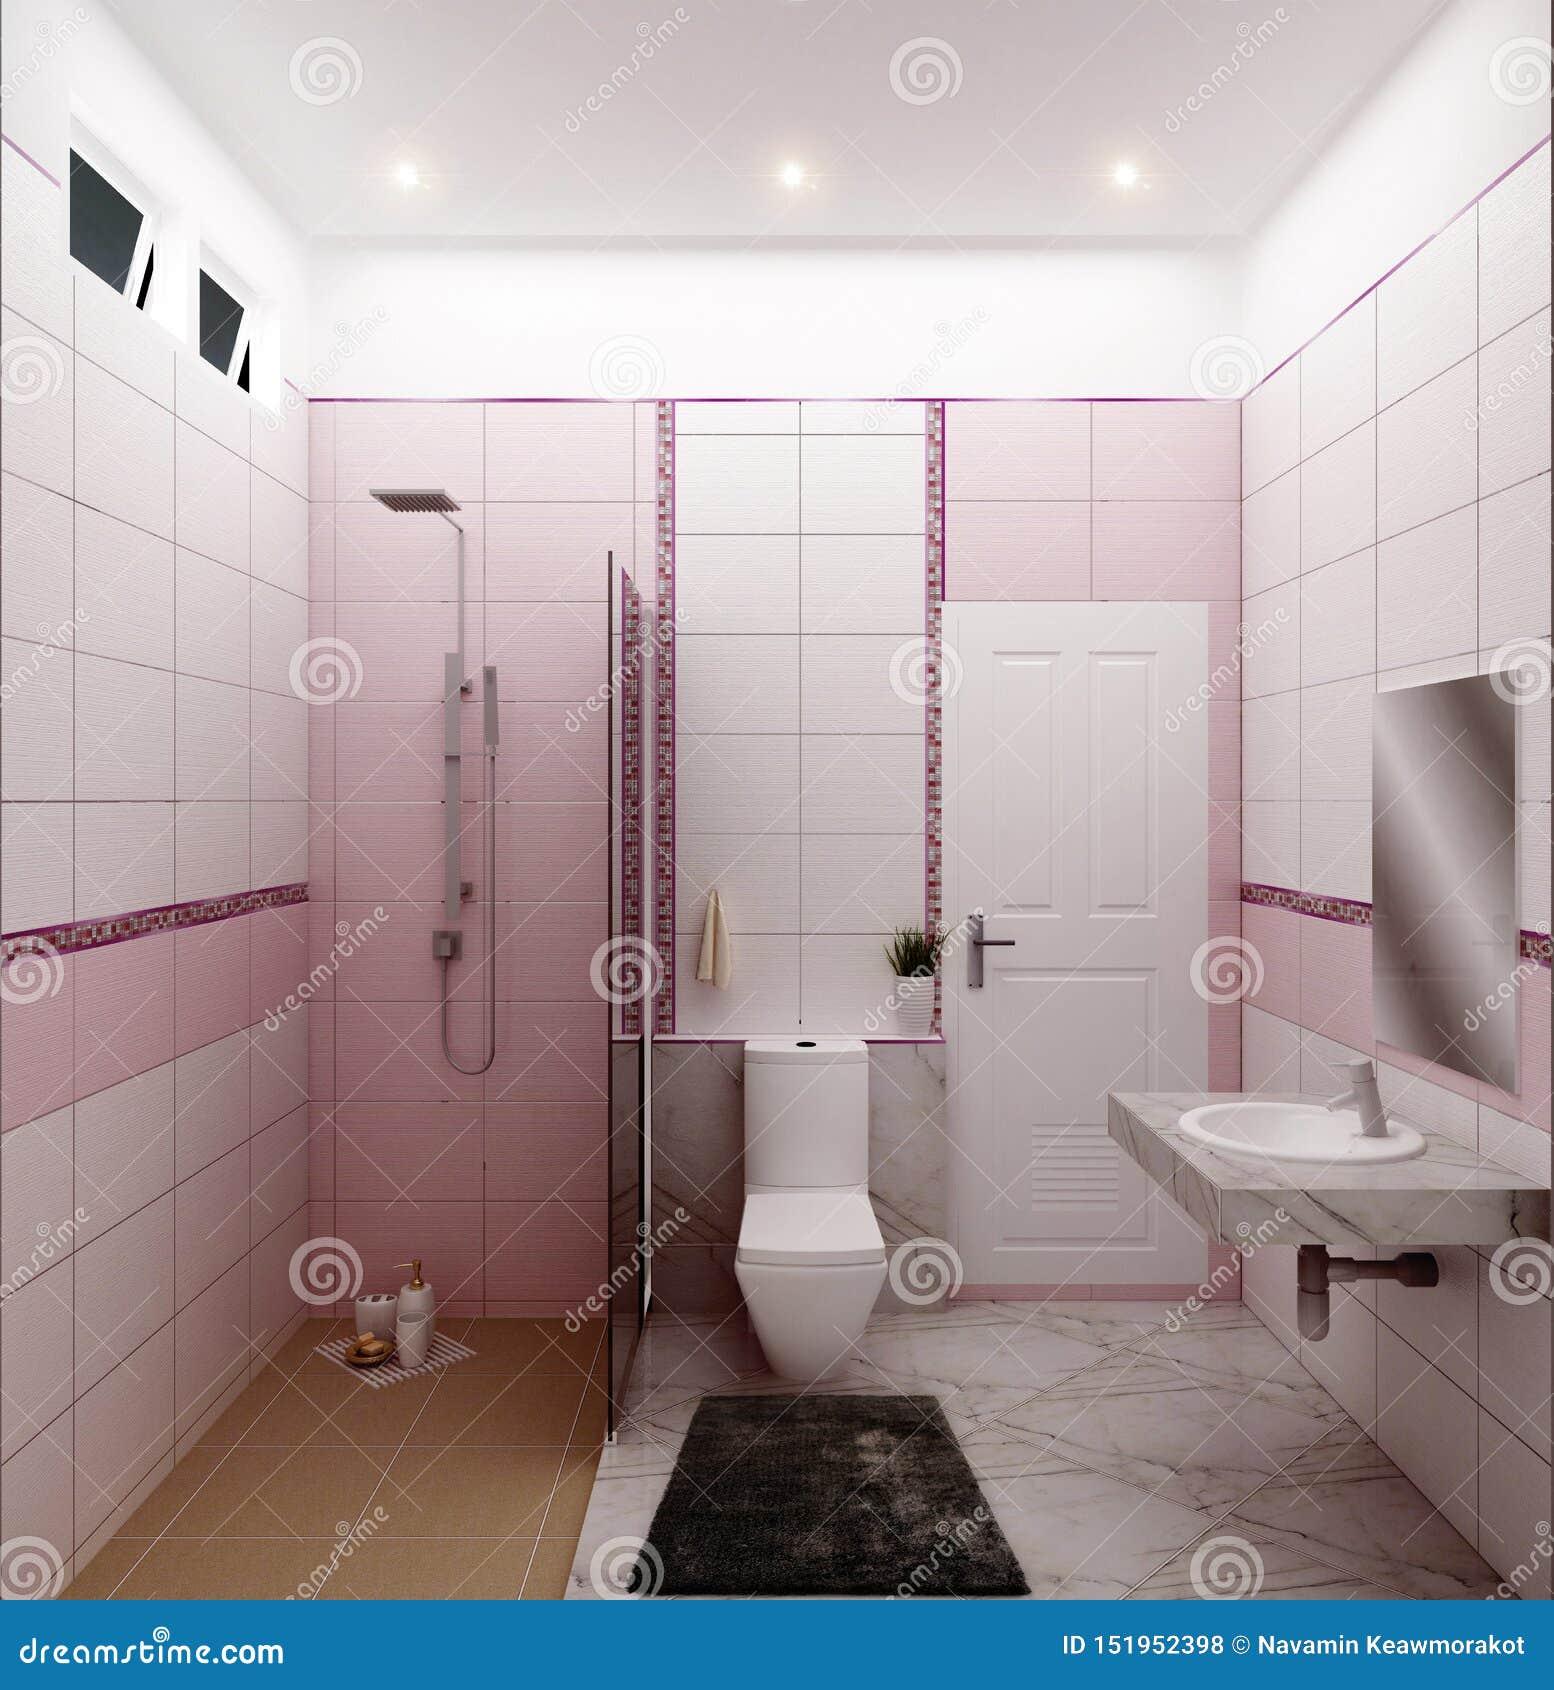 Bright Bathroom Design Tiles Pink Modern Style. 3D Rendering ...